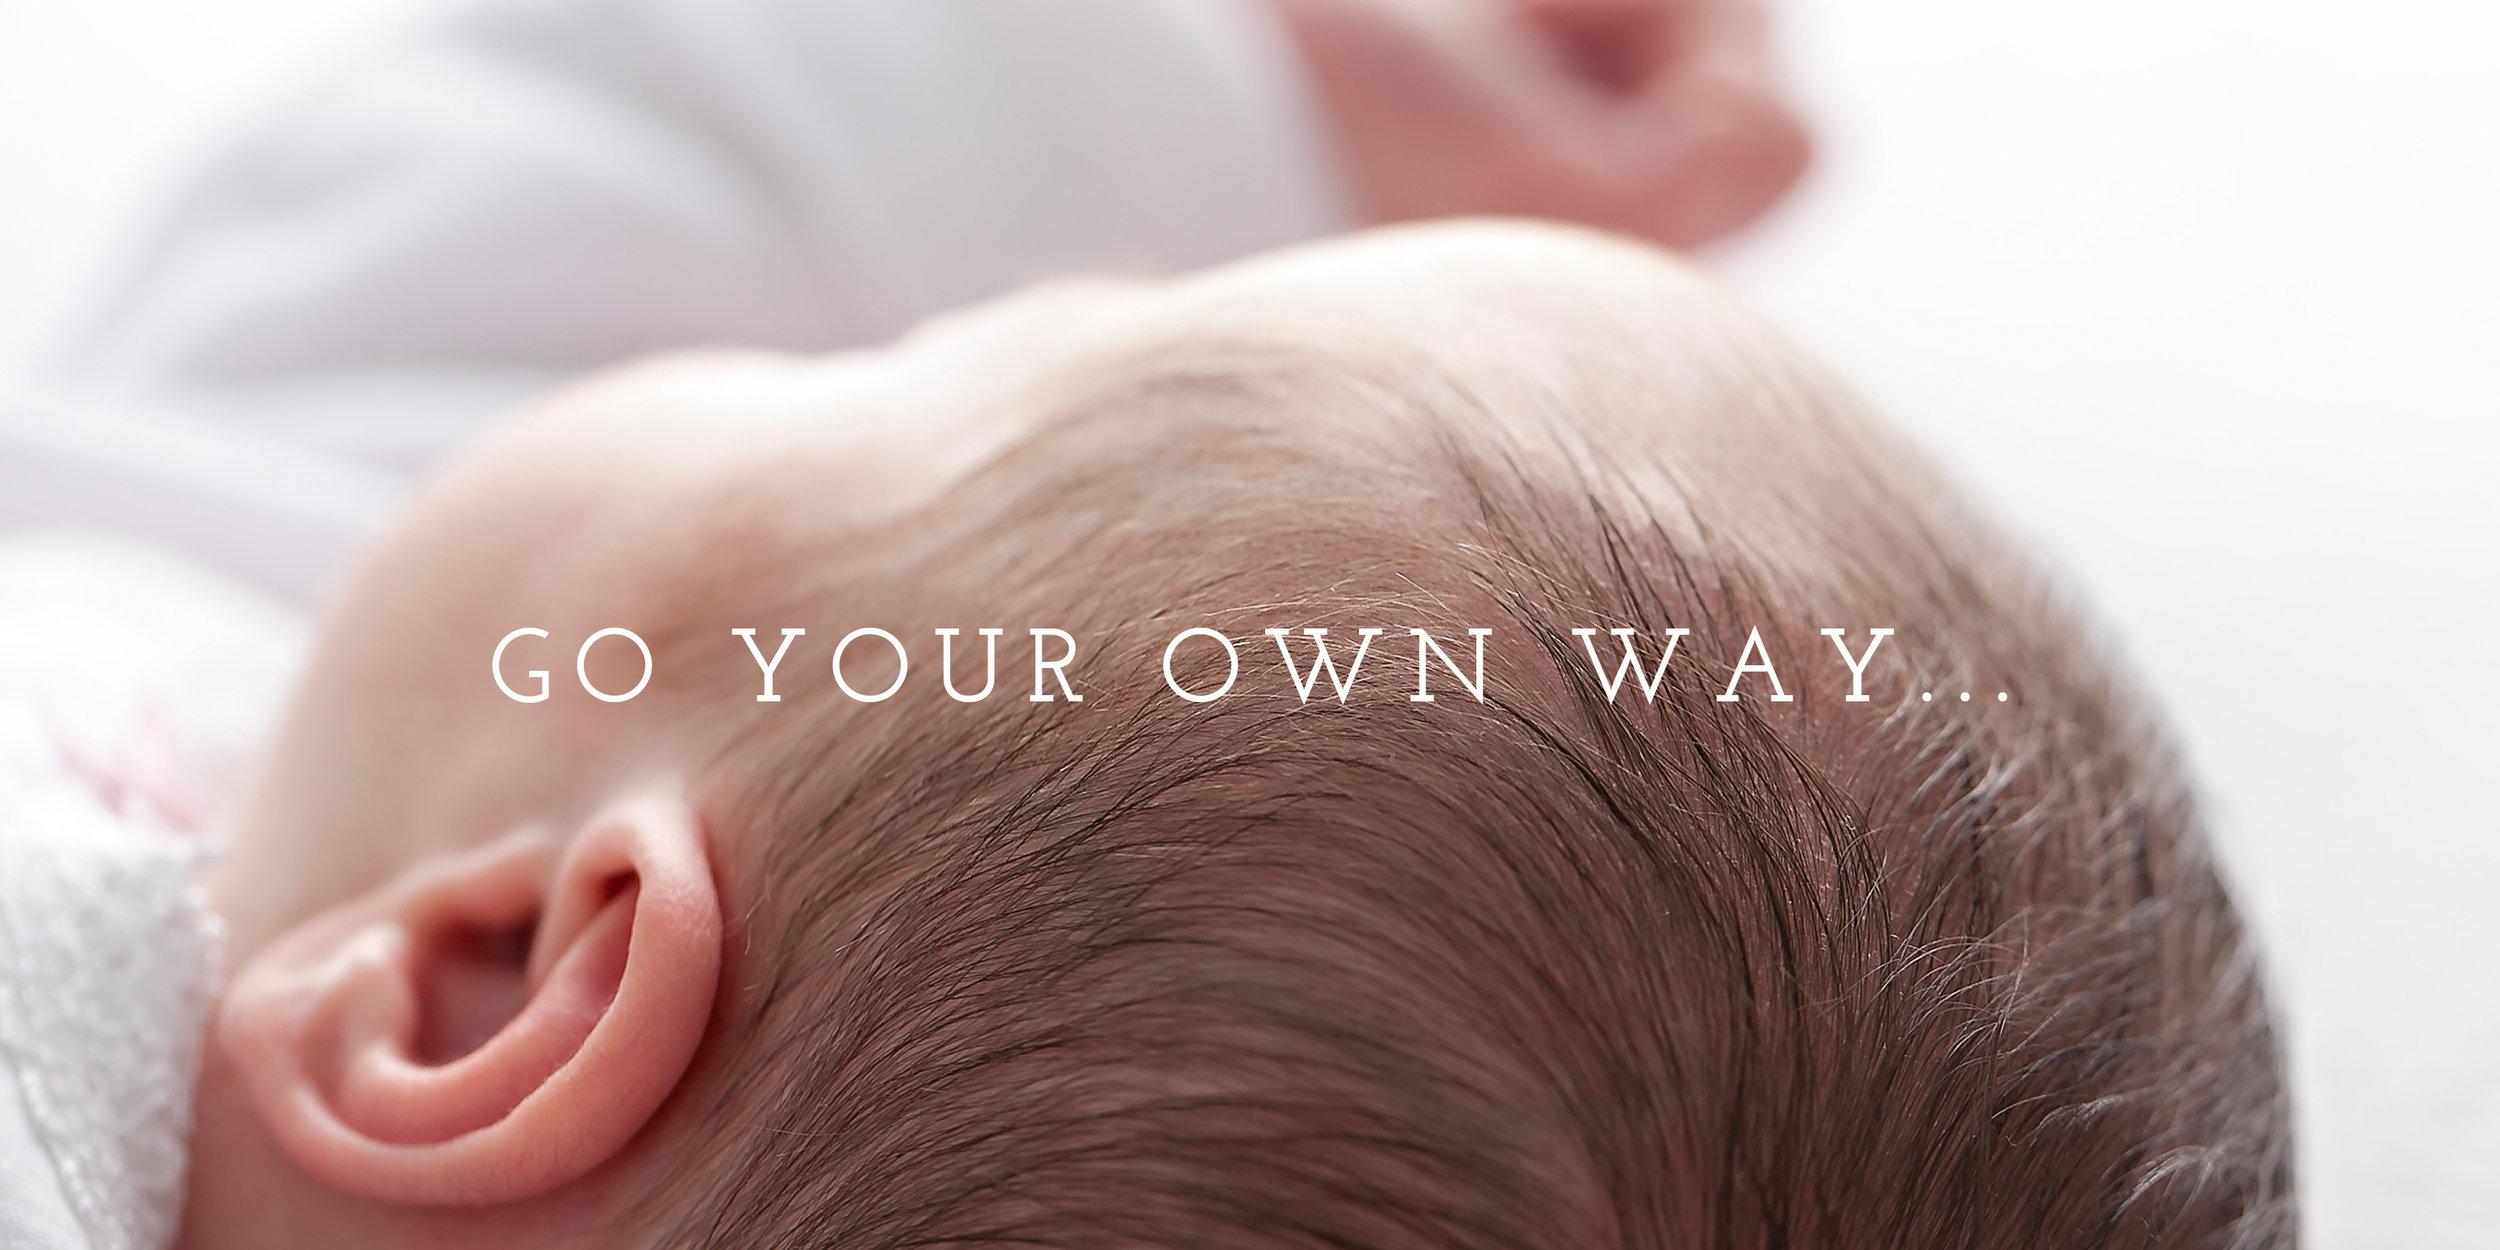 Oshawa_Bowmanville_Durham_Region_Toronto_Baby_Maternity_Photographer_Petra_King_Photography